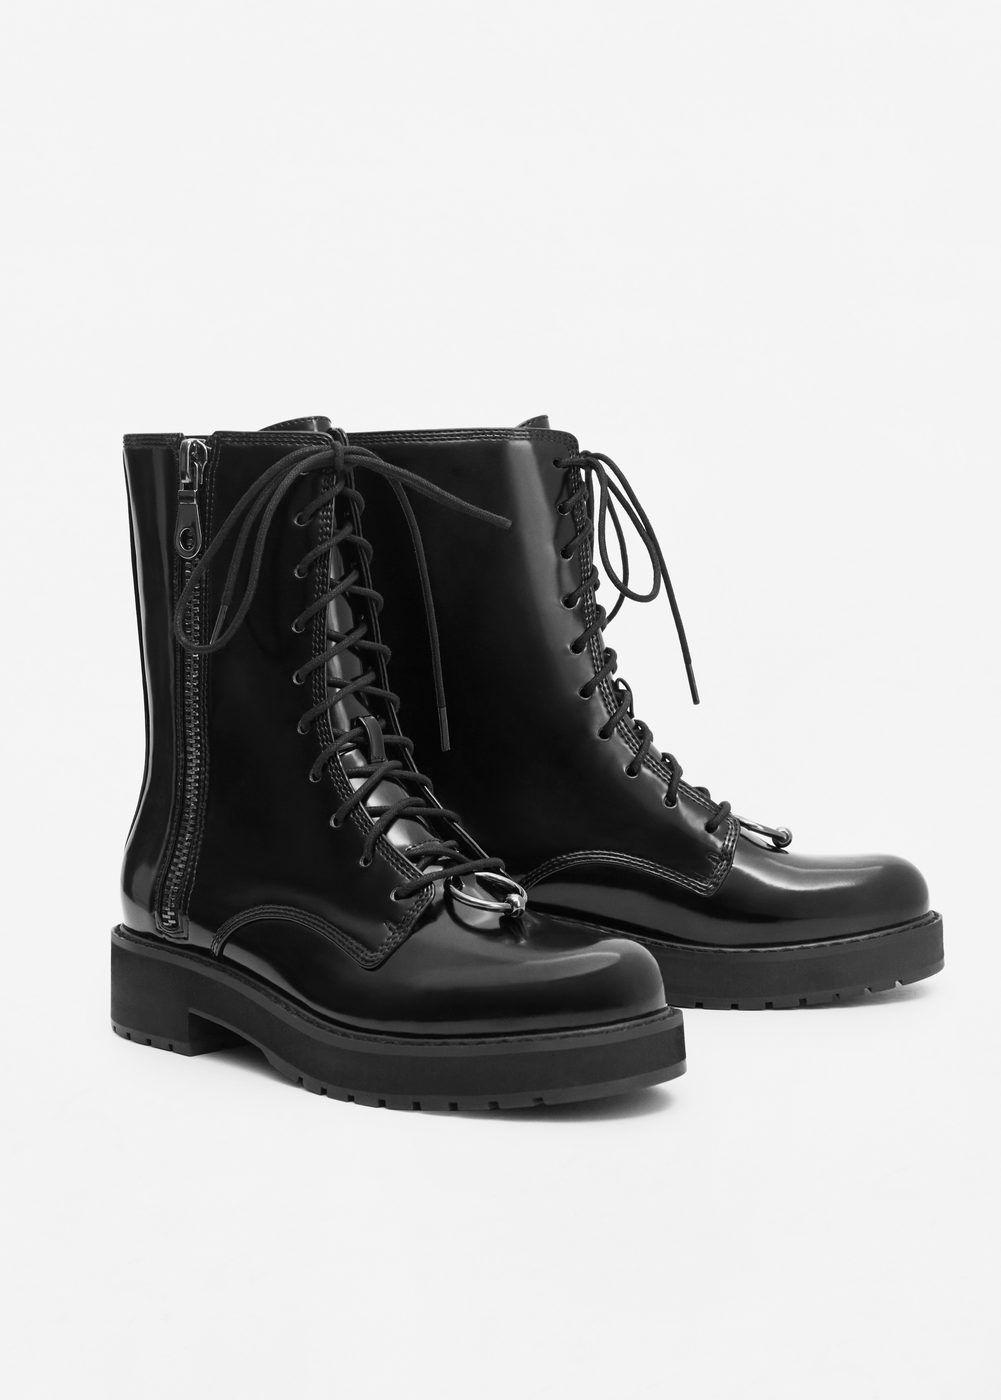 d9fb689c70458 Bota charol cordones - Zapatos de Mujer